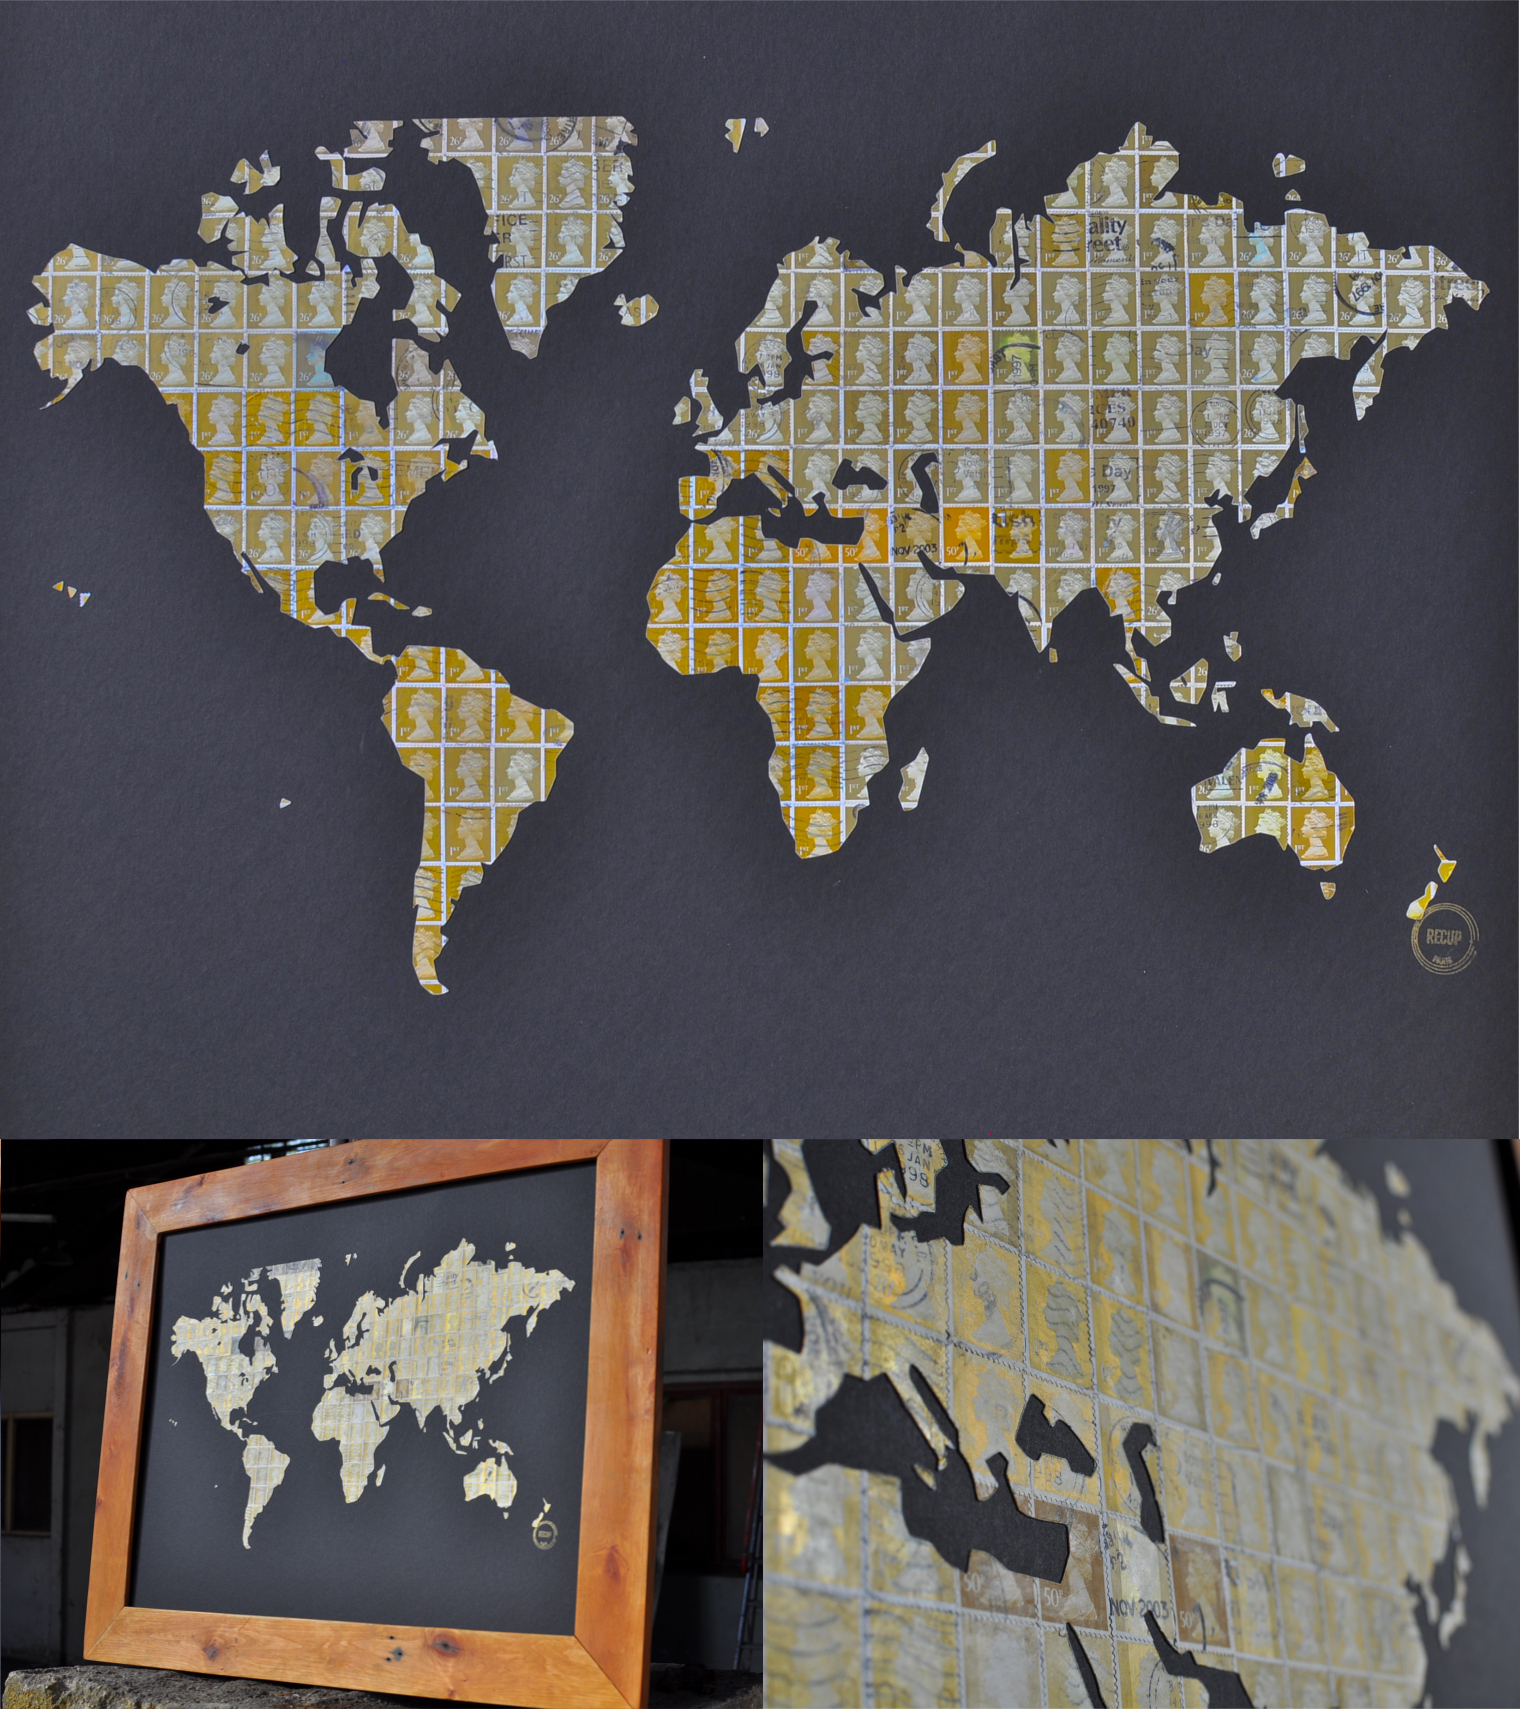 images_for_kickstarter_-_World_Map_Gold-1478731665.jpeg